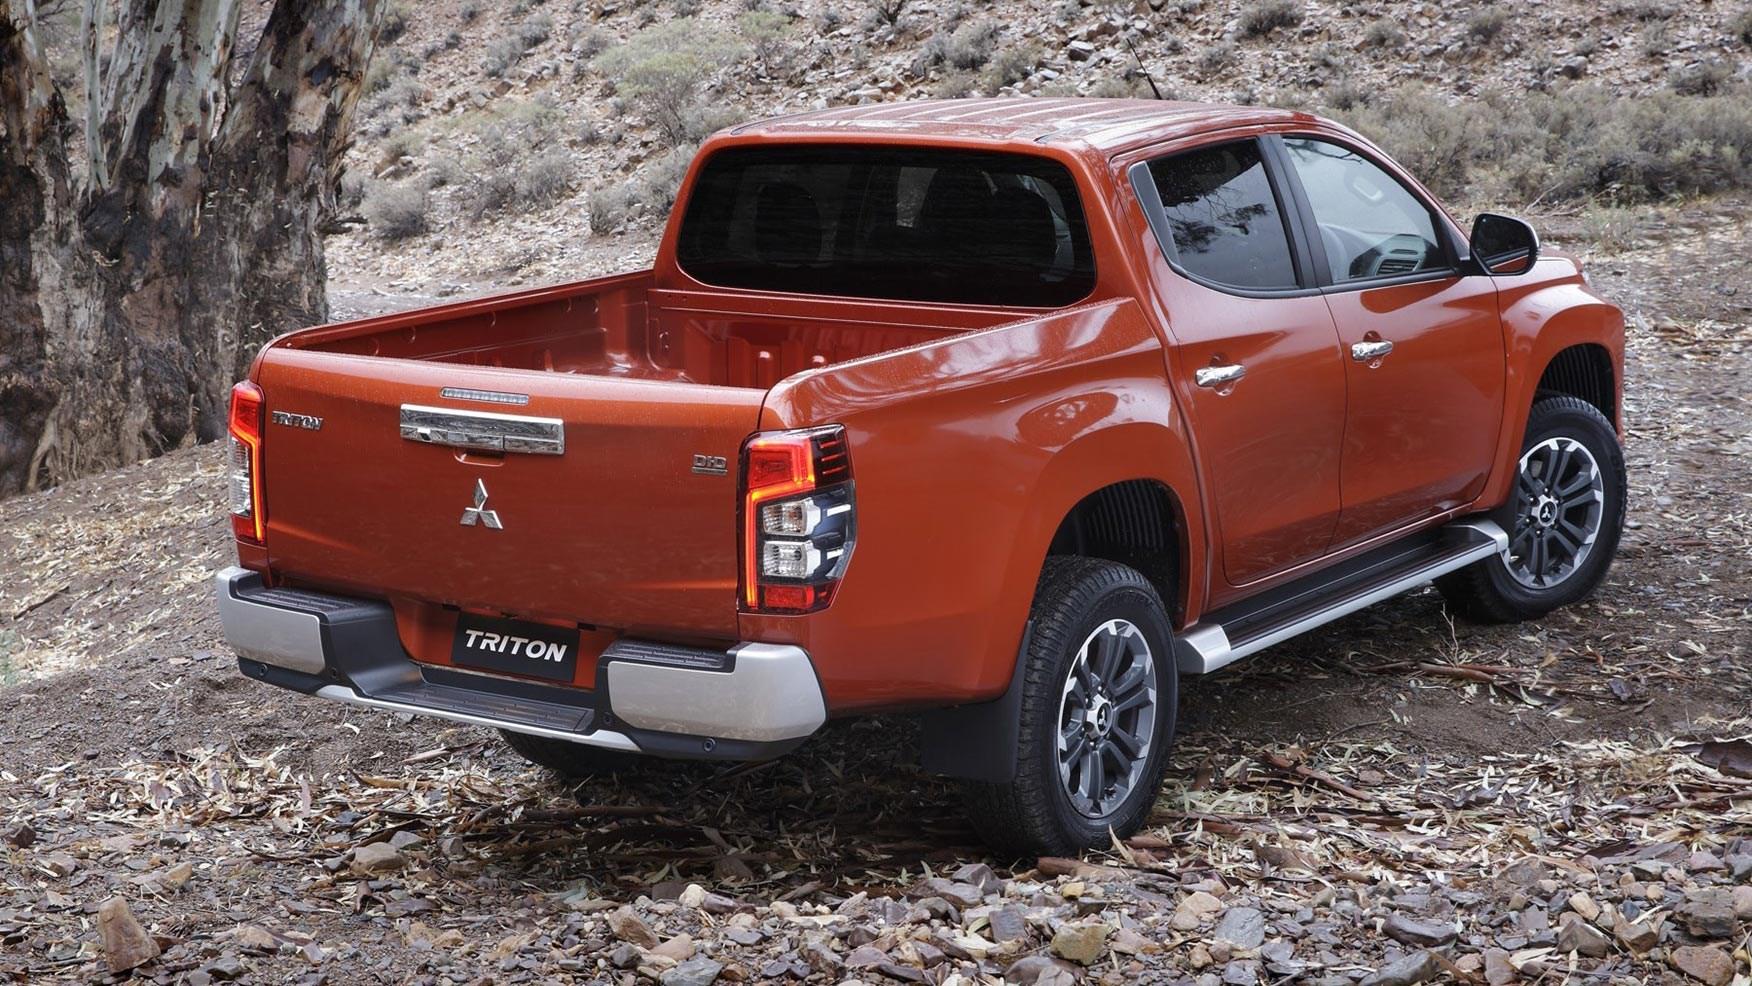 mitsubishi l200 2019 pick up truck review car magazine. Black Bedroom Furniture Sets. Home Design Ideas